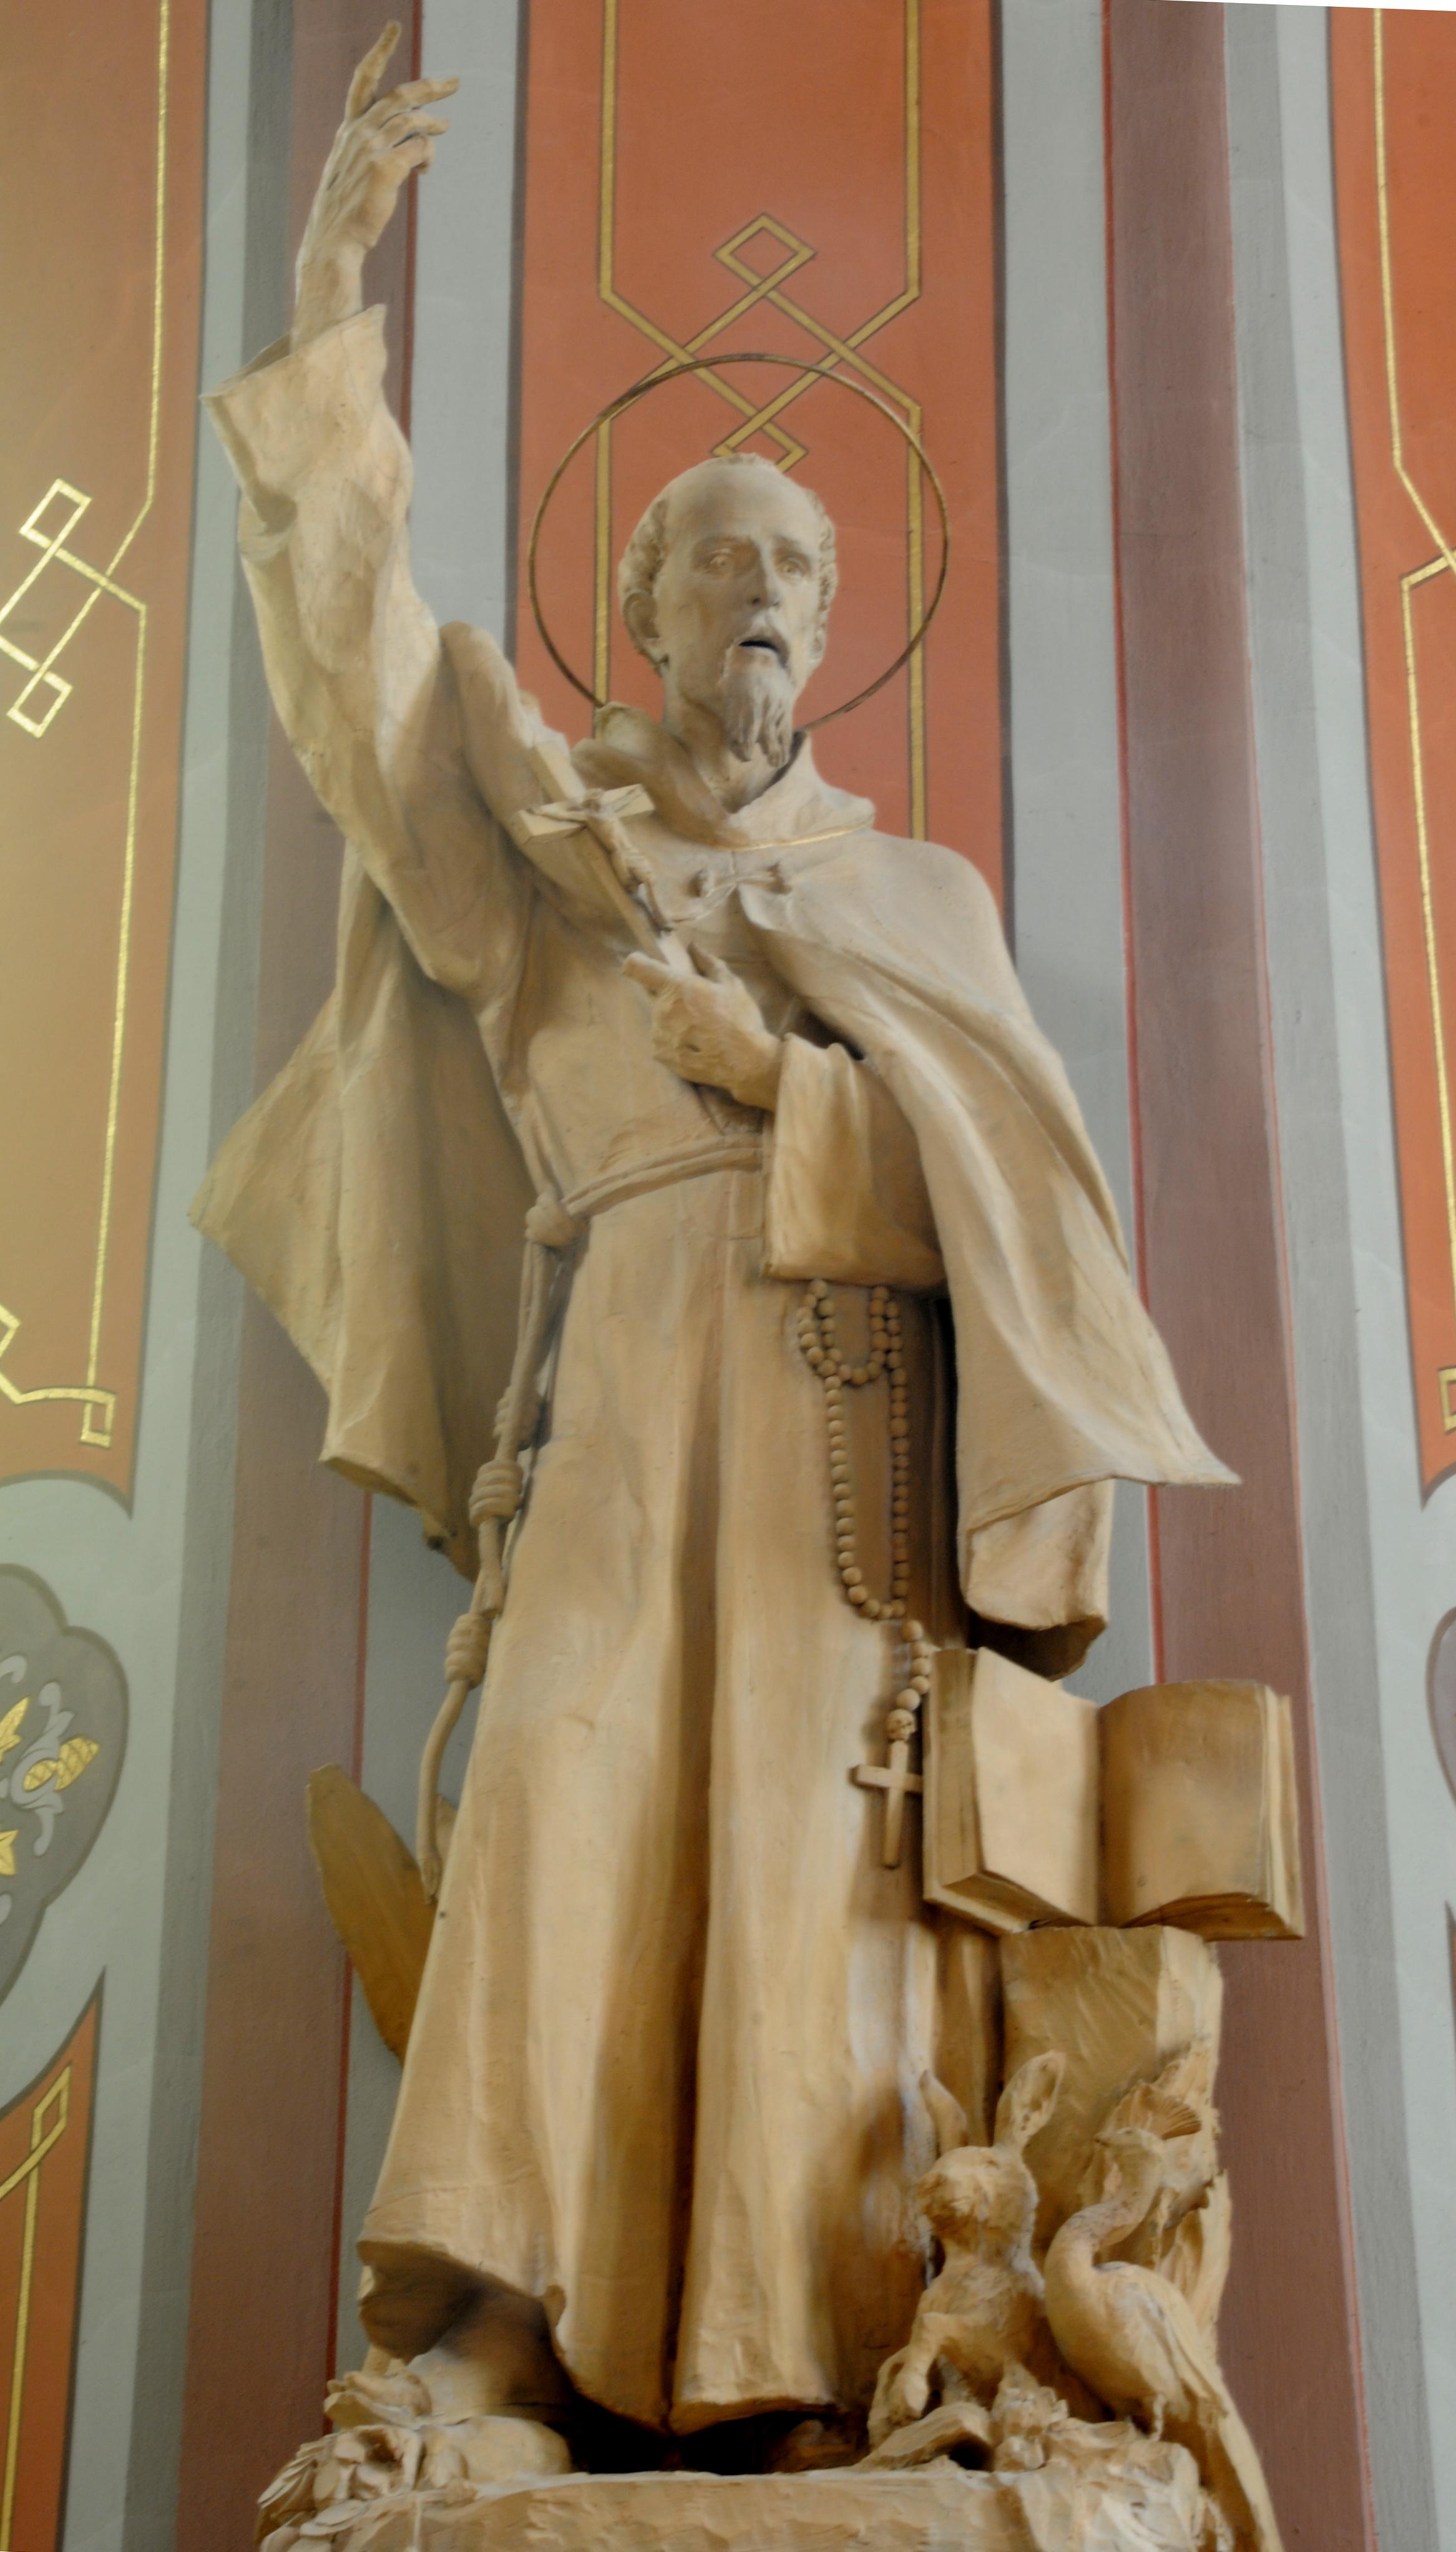 1000+ images about Saint Francis, Patron Saint of animals on.